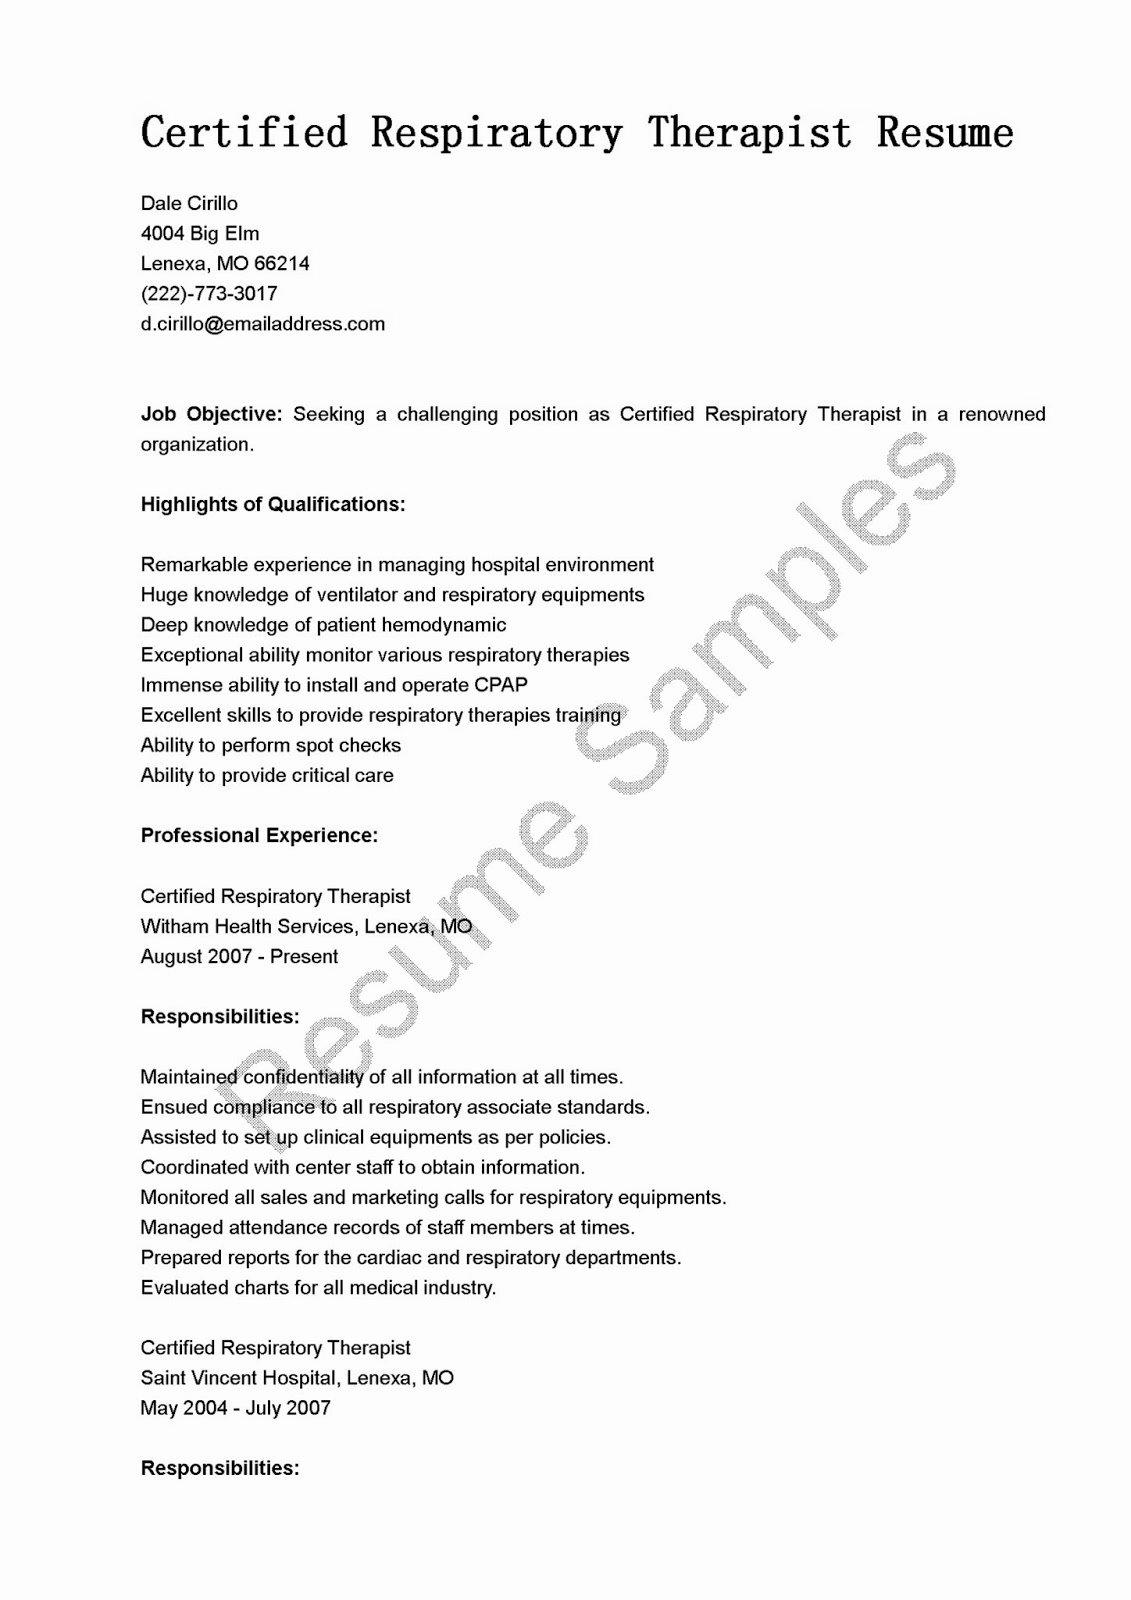 Resume Samples Certified Respiratory therapist Resume Sample